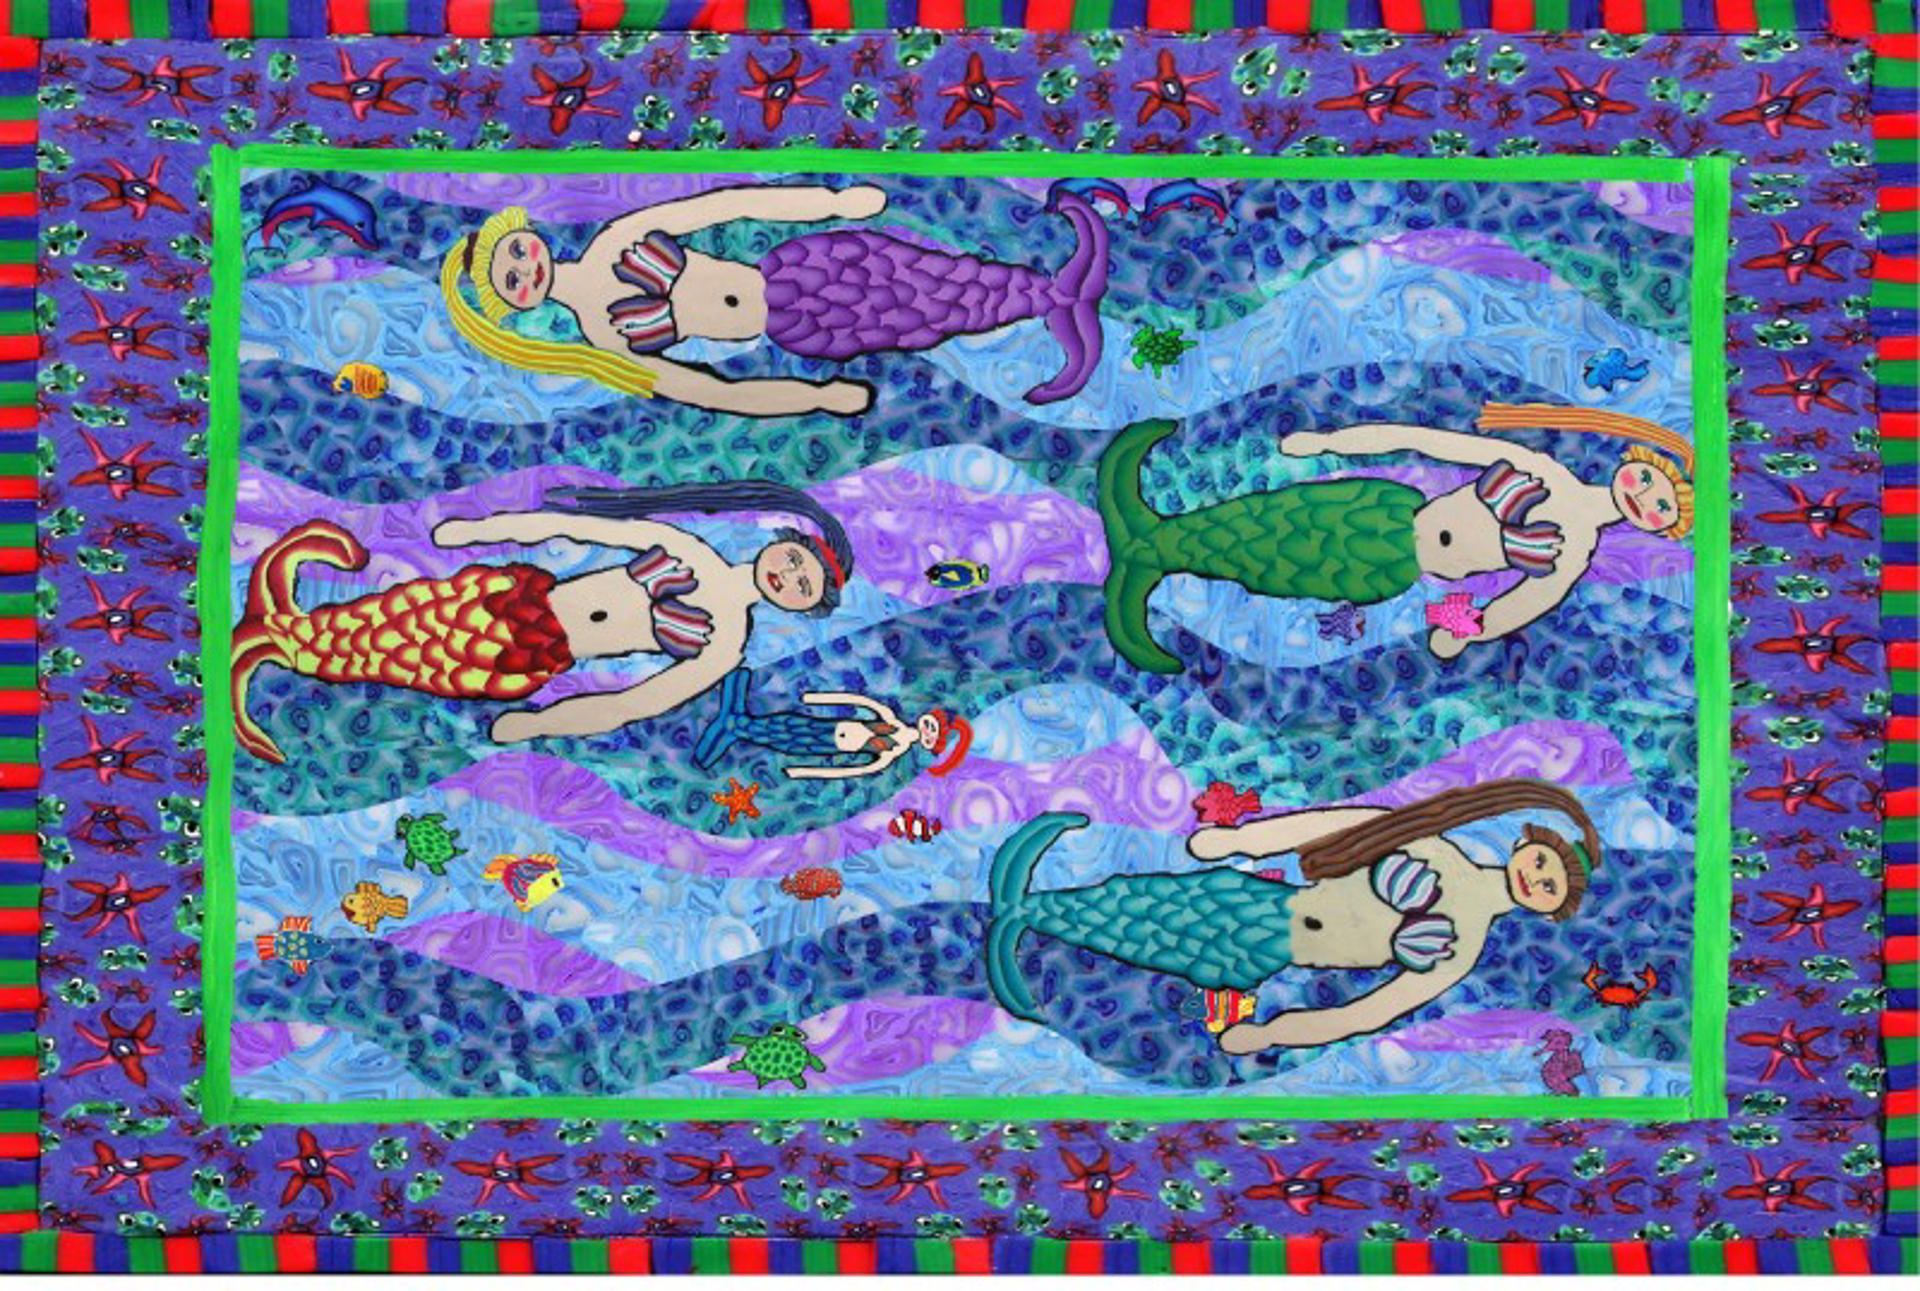 Swimming Mermaids by Samantha Long - Prints